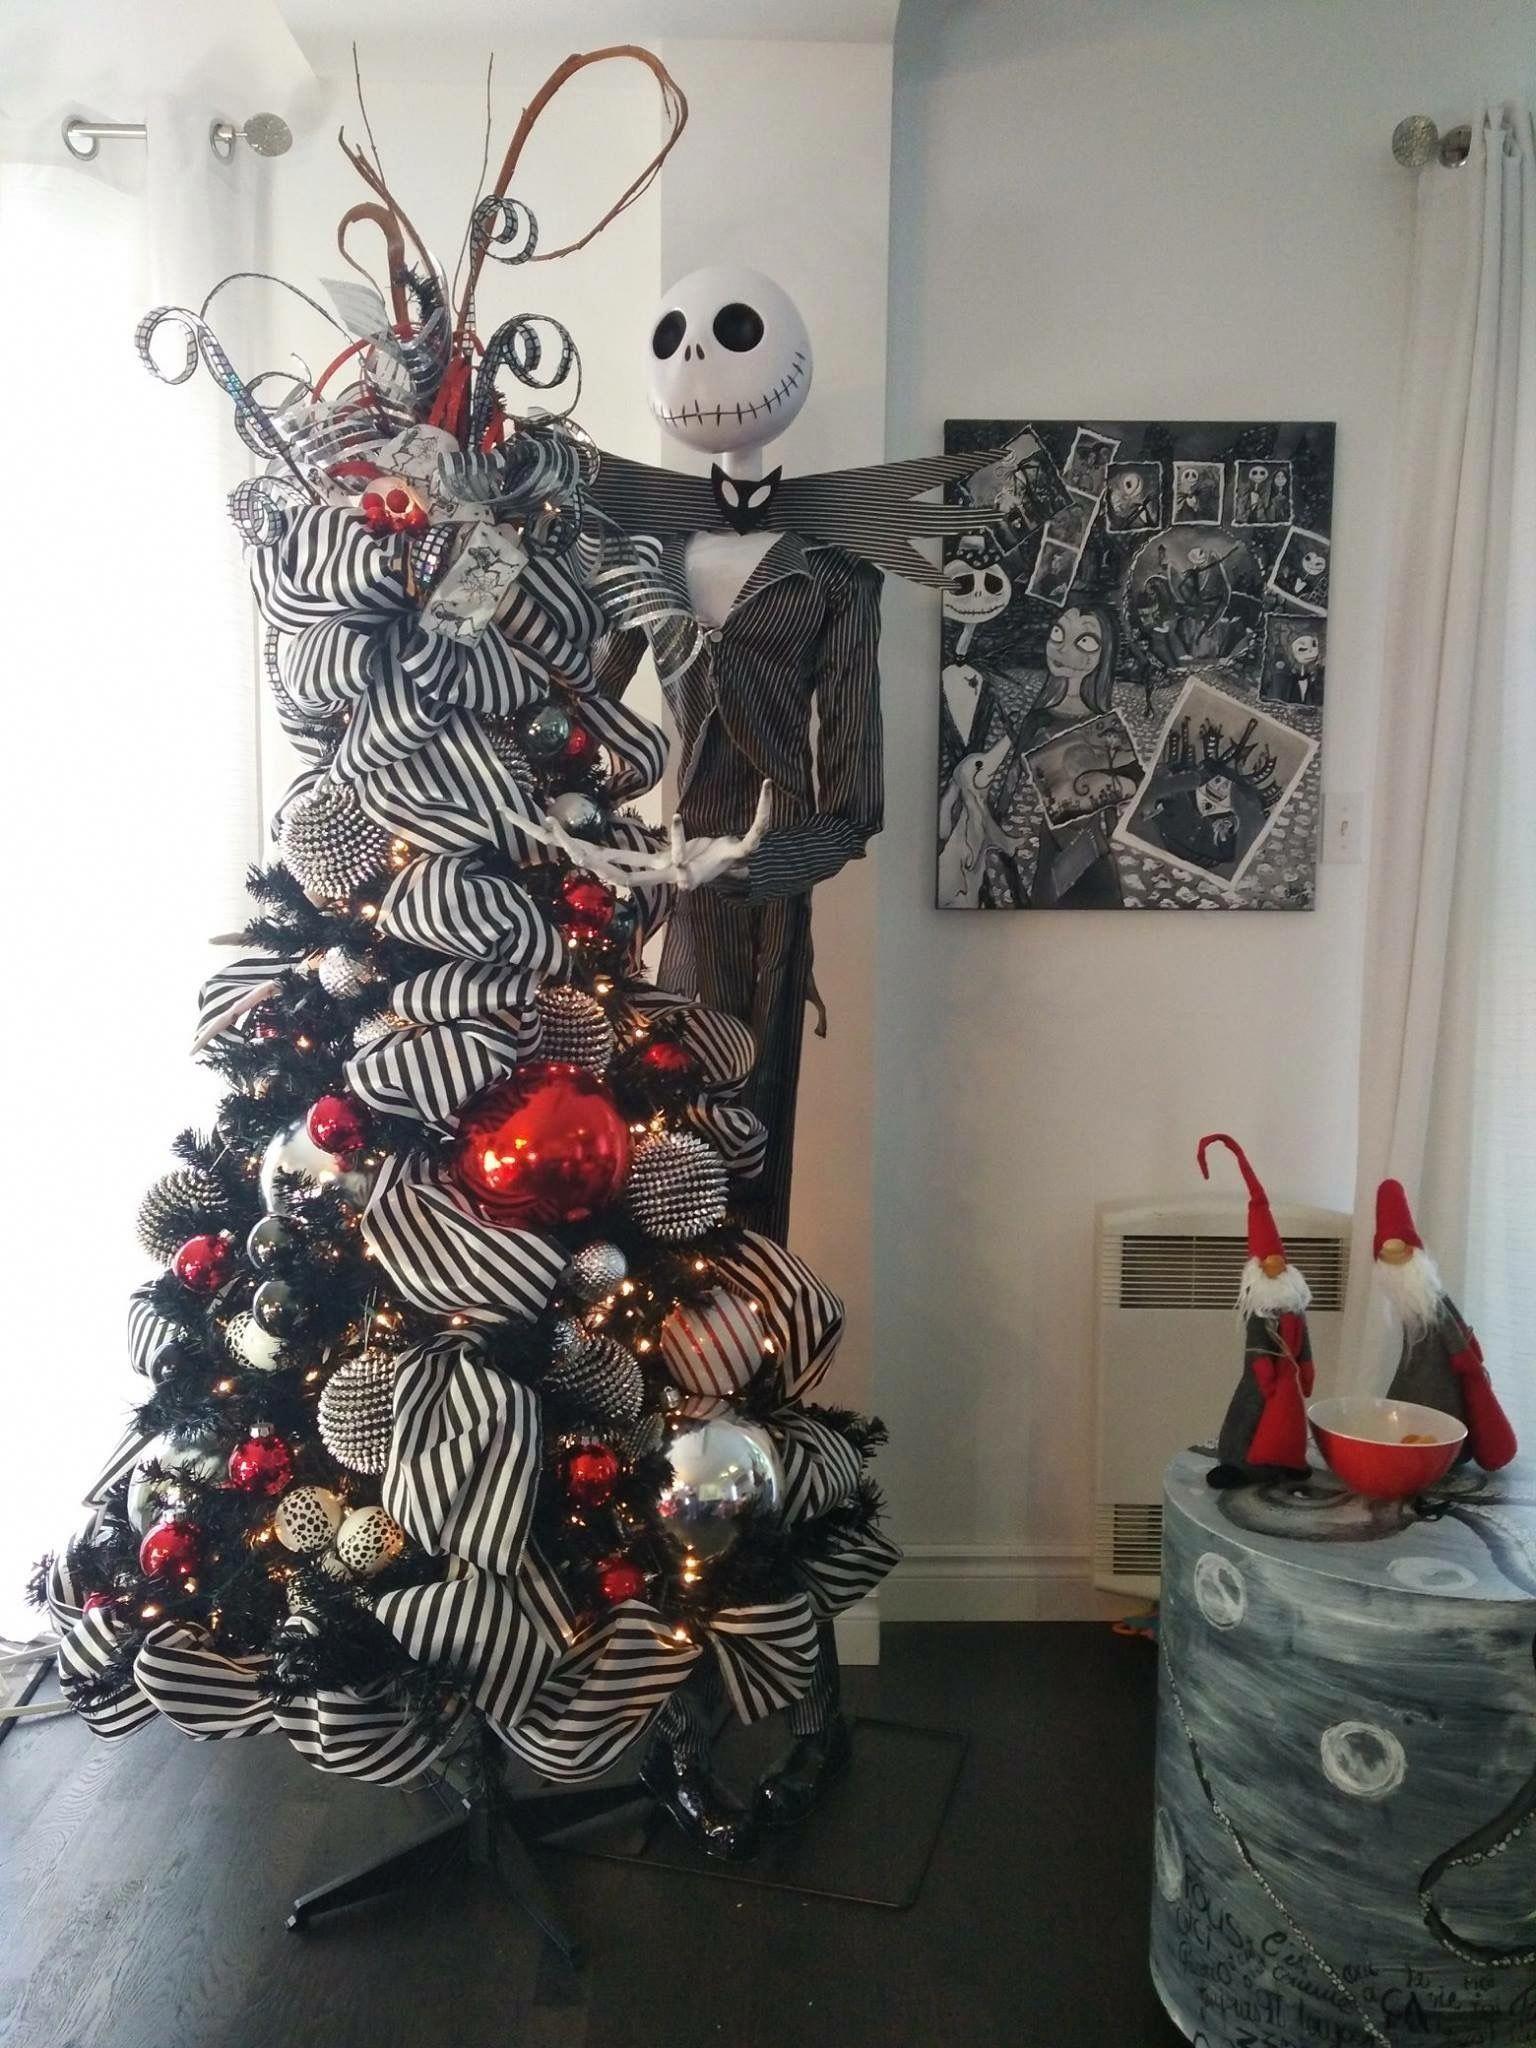 Nightmare before christmas tree SpanishmerryChristmas